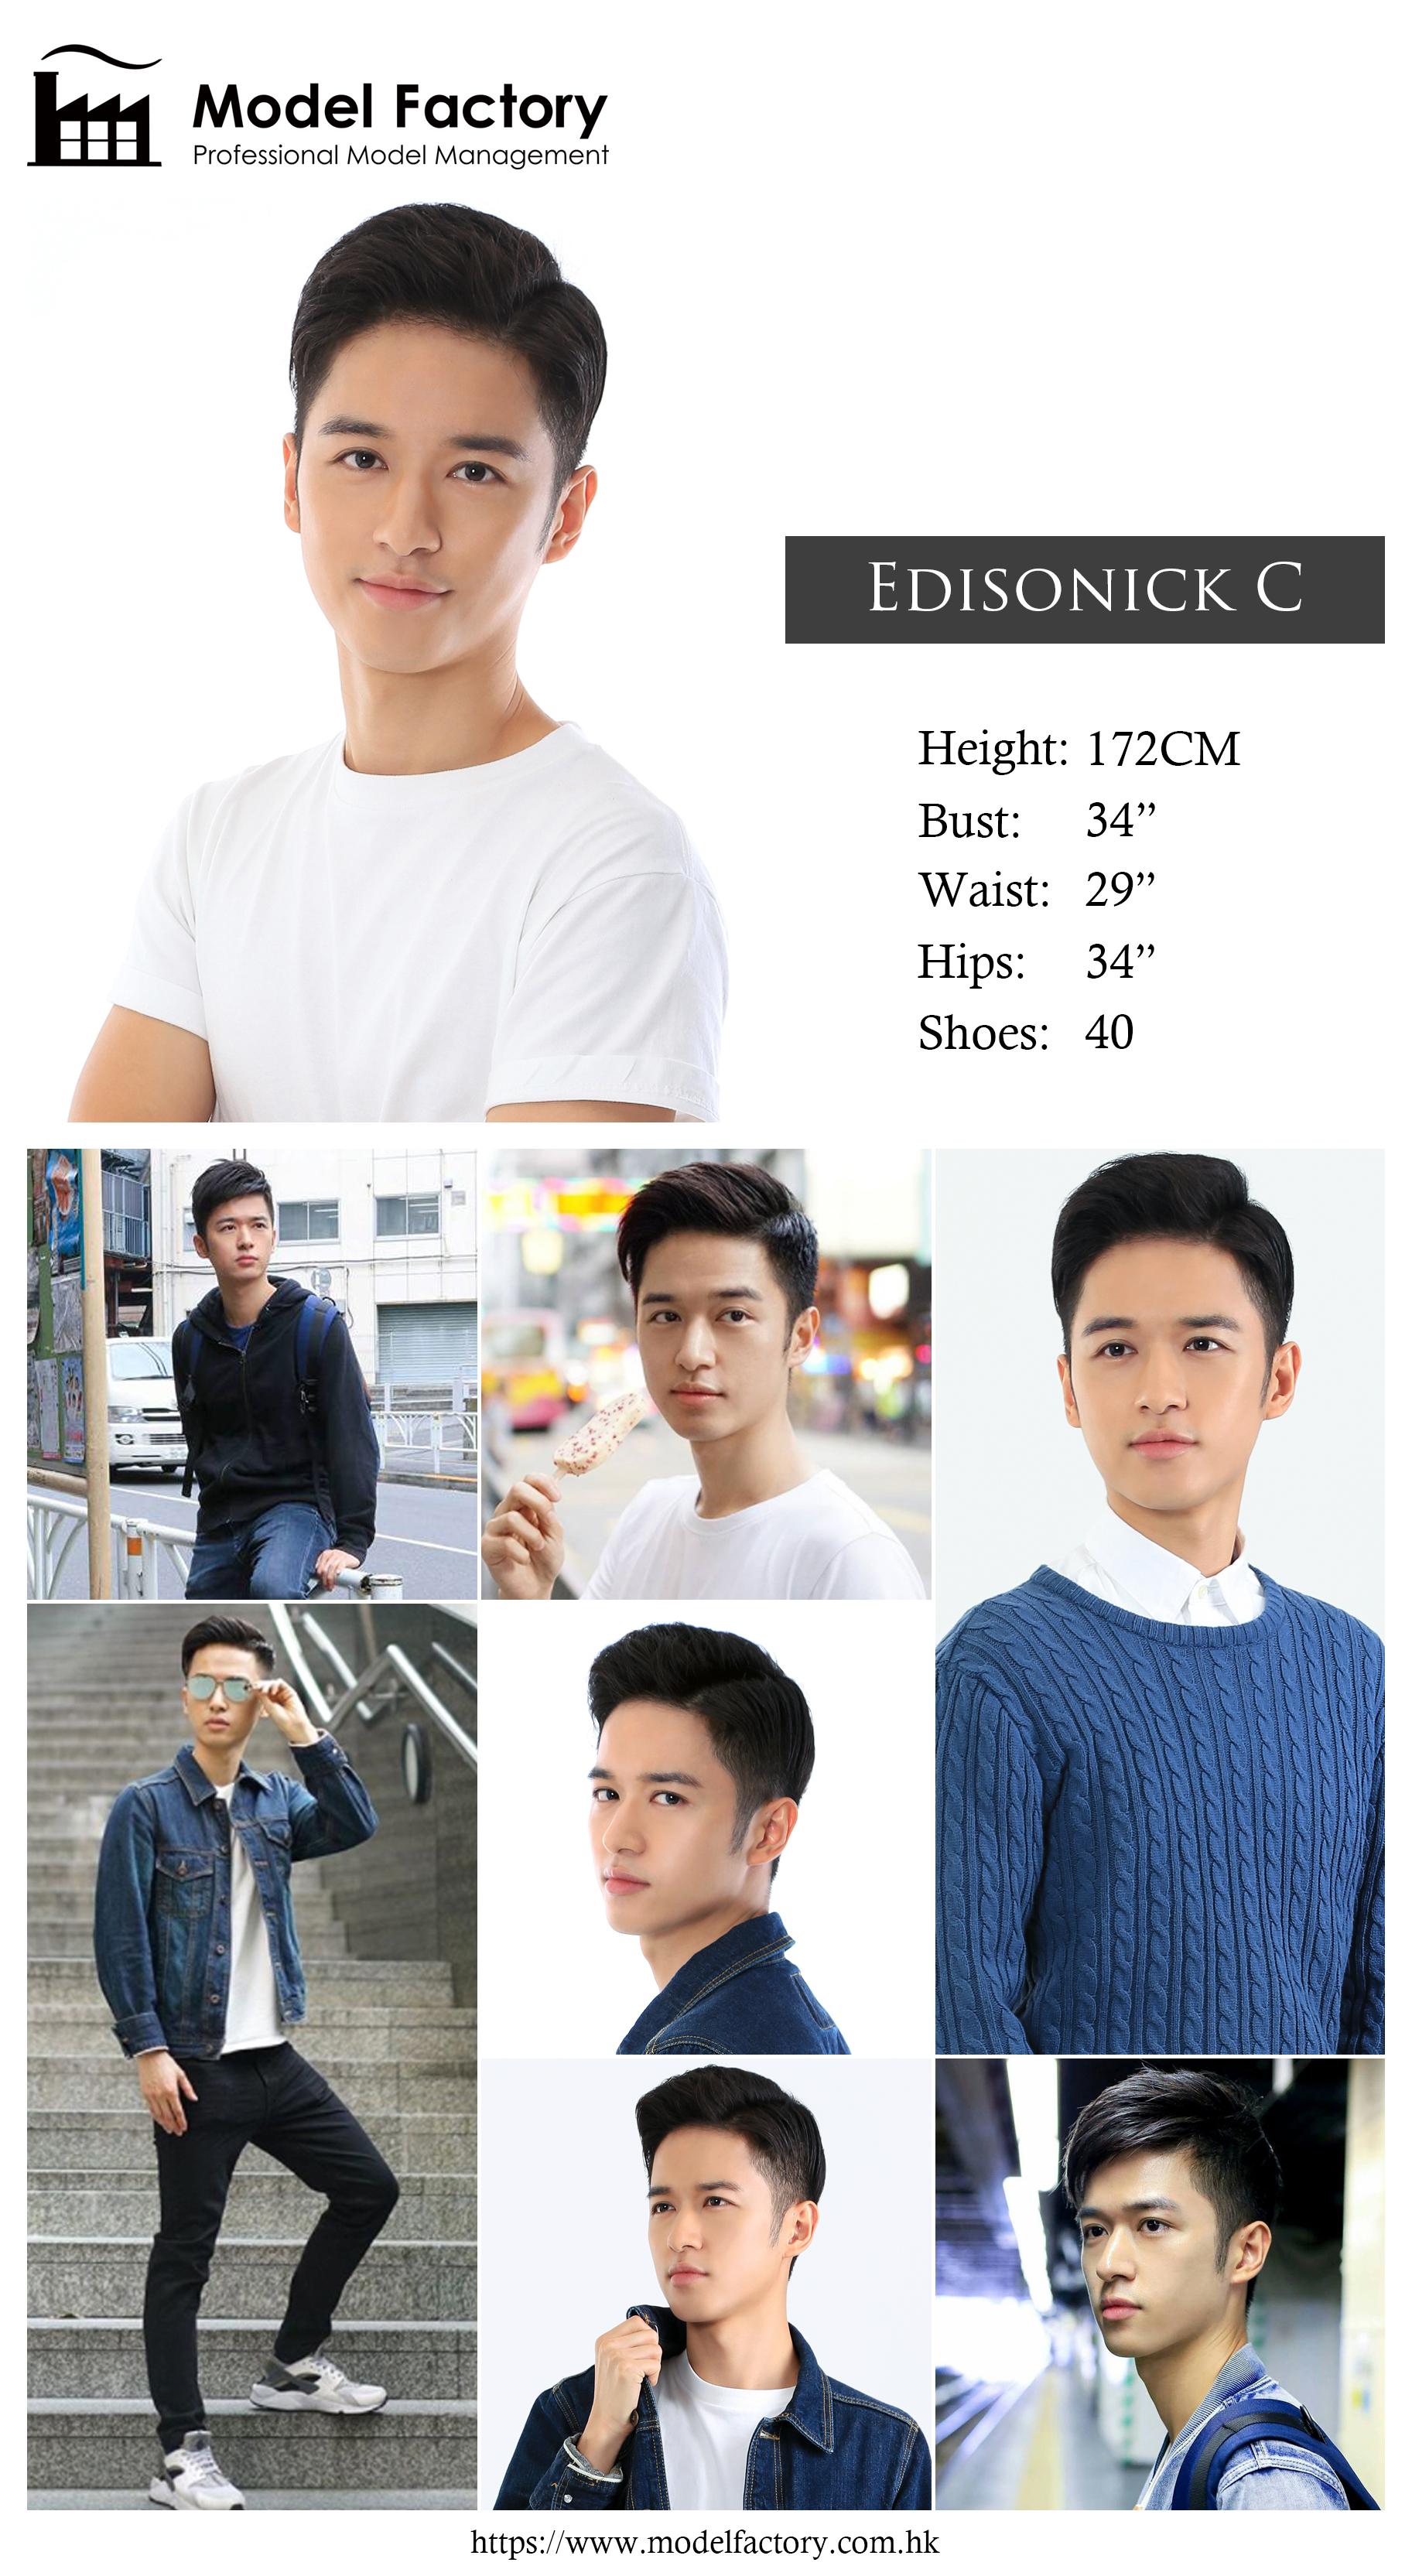 Model Factory Hong Kong Male Model EdisonickC